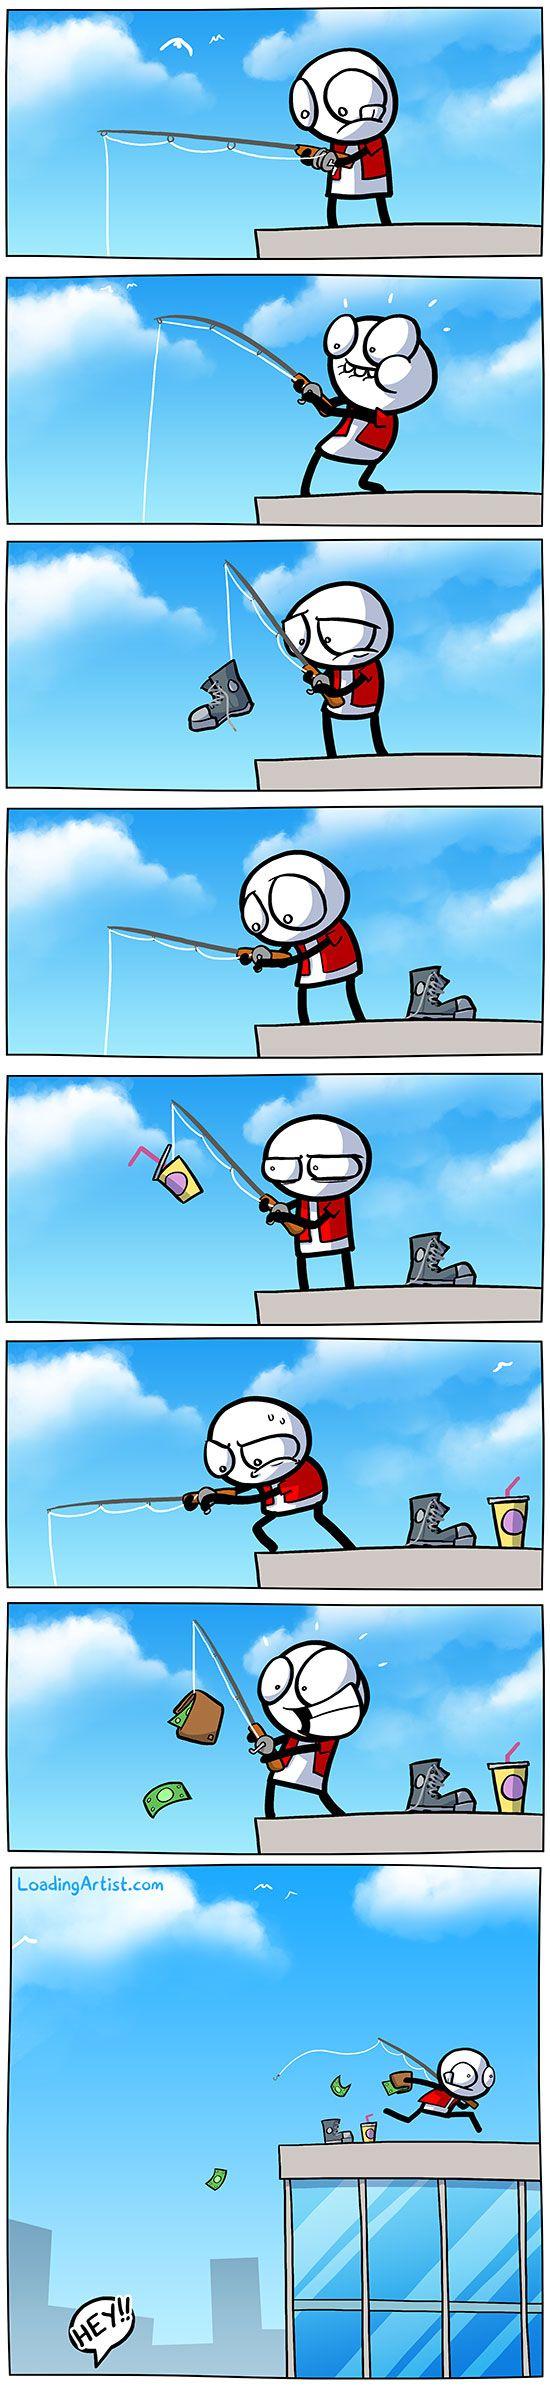 Loading Artist » Fishing For Success